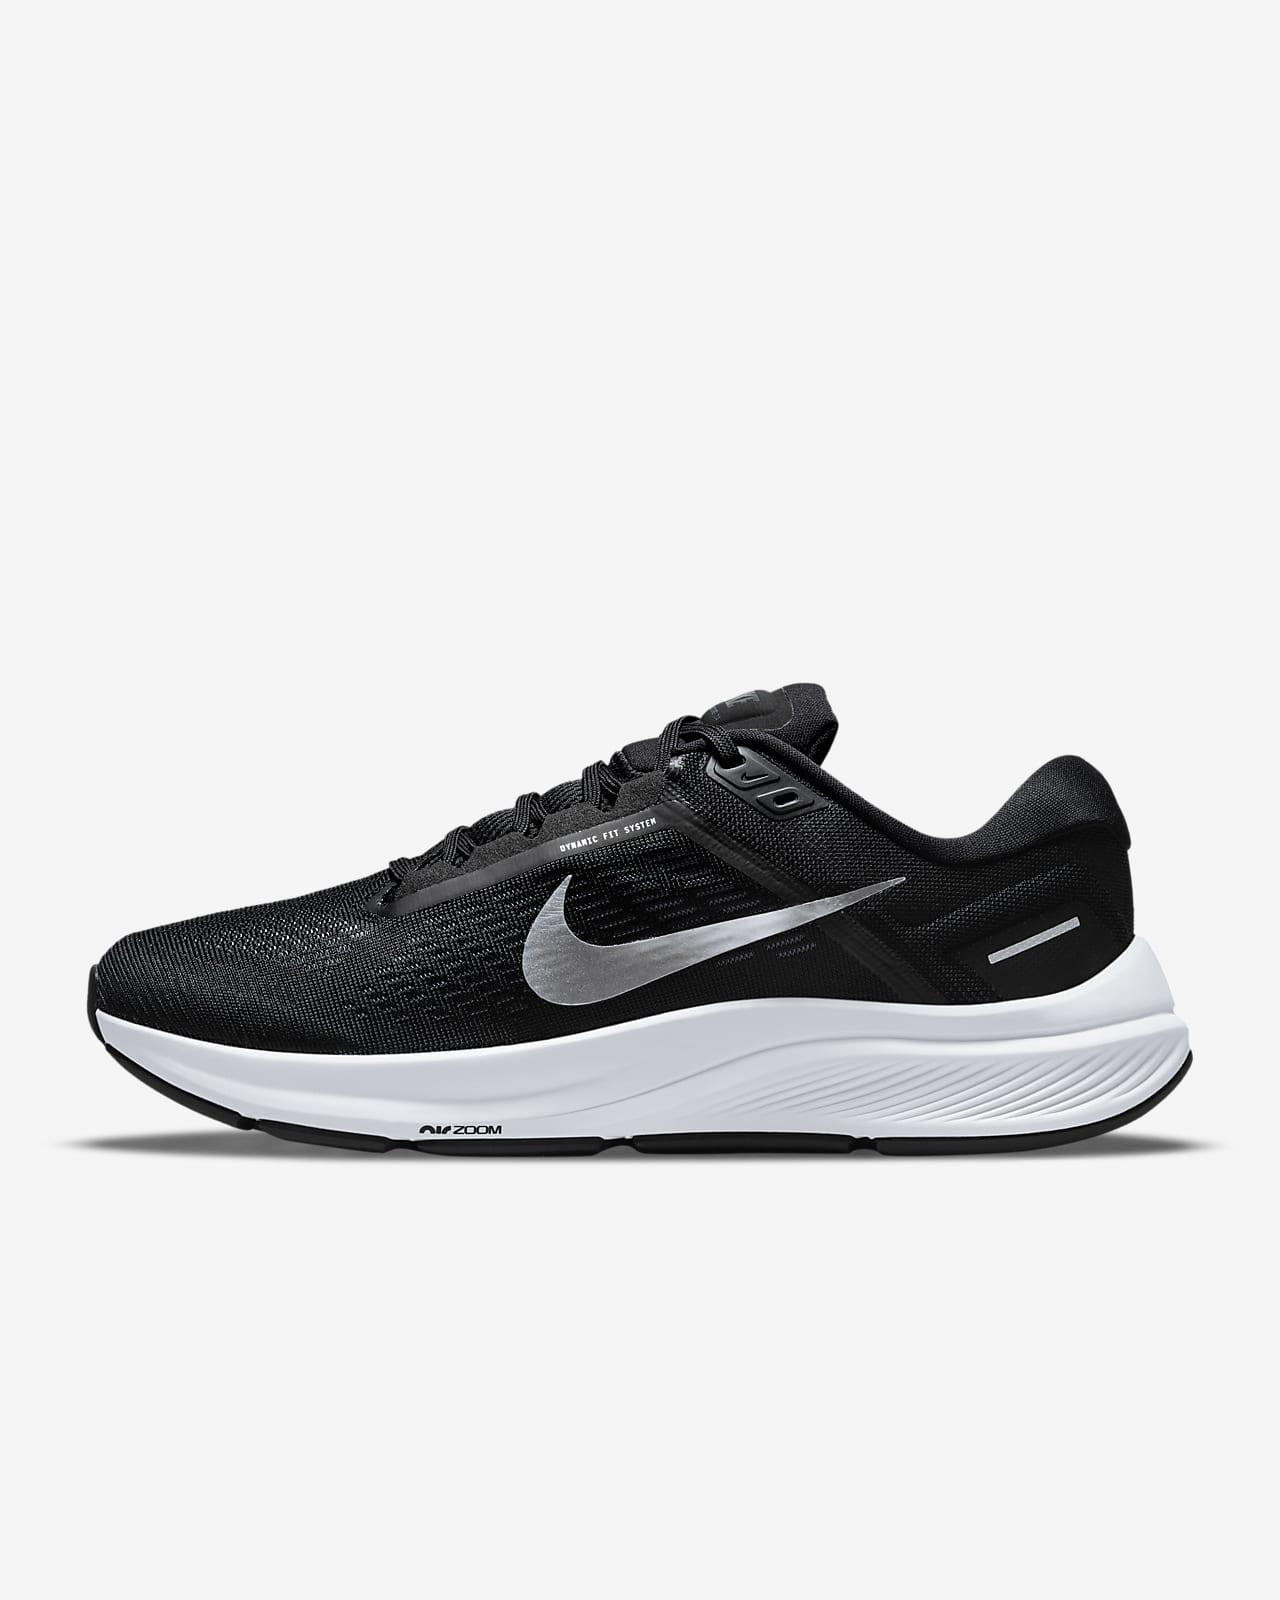 Scarpa da running su strada Nike Air Zoom Structure 24 - Uomo